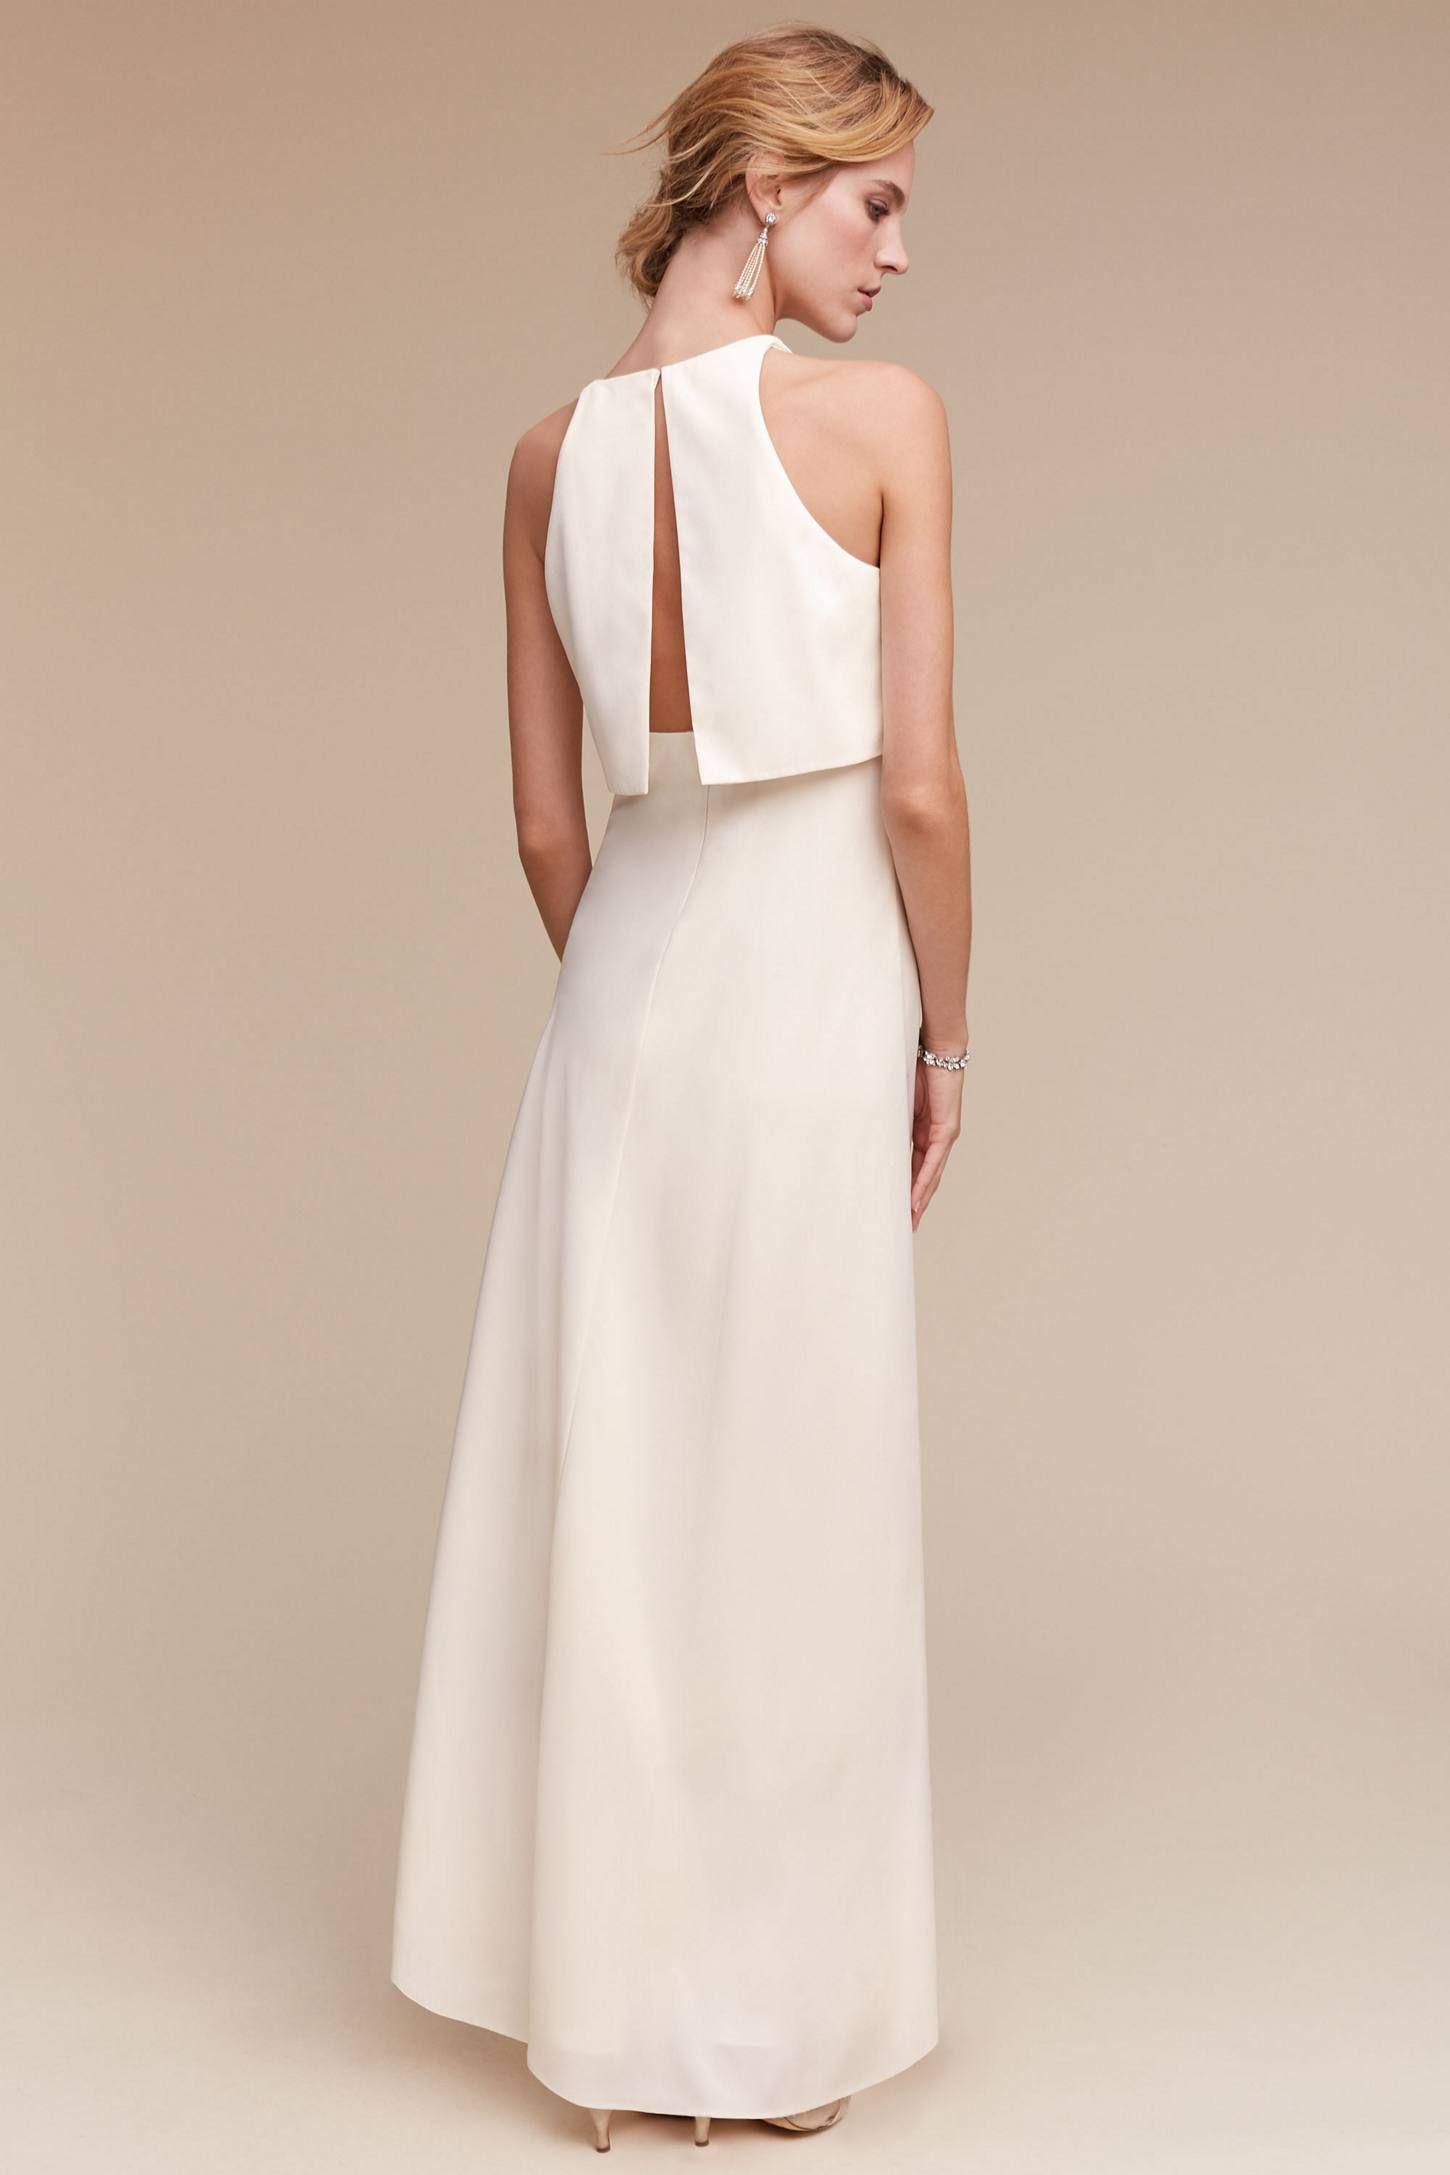 7ff0fa11a157 Slide View  2  Iva Crepe Maxi Maxi Dress Wedding